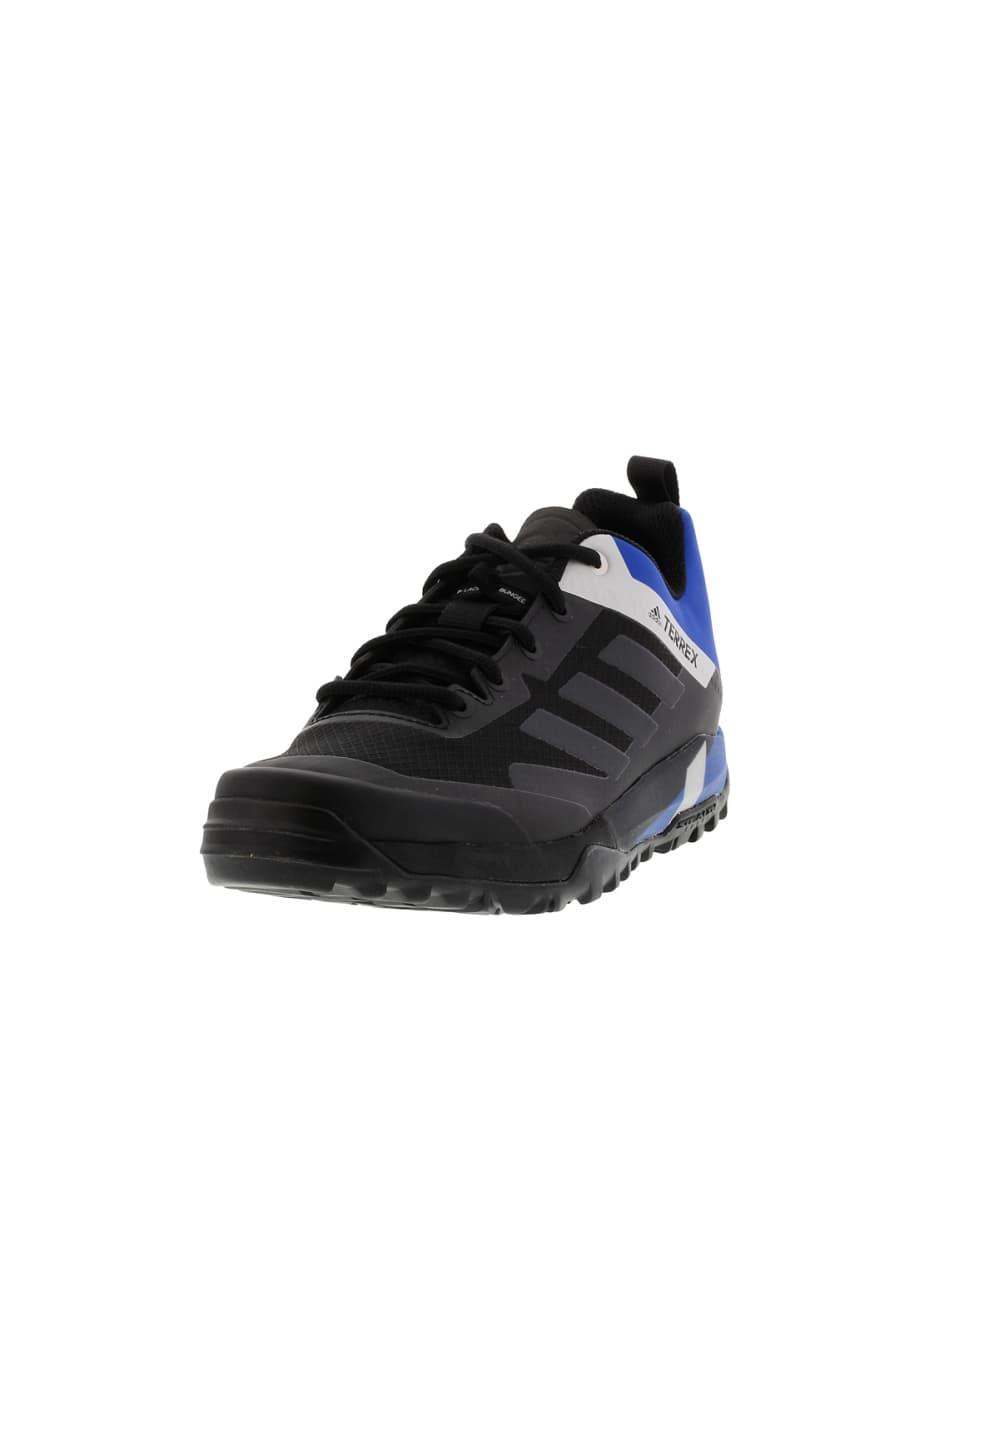 Trail Sl Terrex Adidas Randonnée Cross Nwmn80 Pour Chaussures iPOXkZu